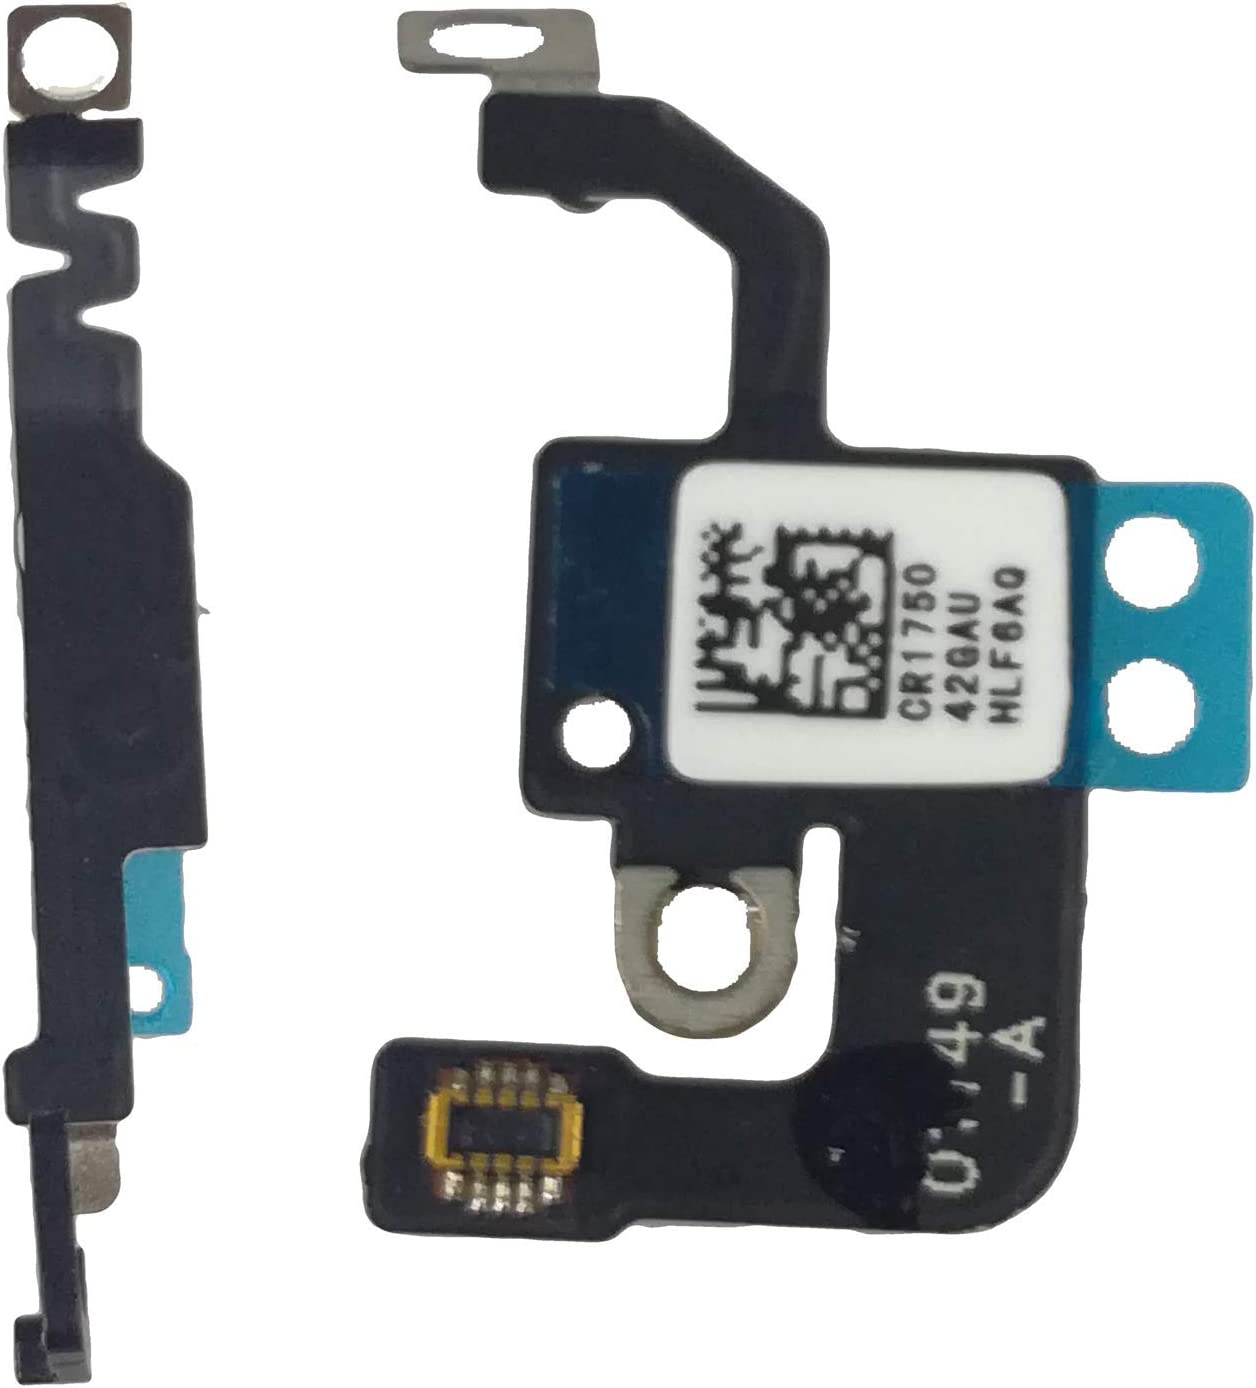 Waipawama - Antena WiFi para iPhone 8 Plus (Incluye módulo ...